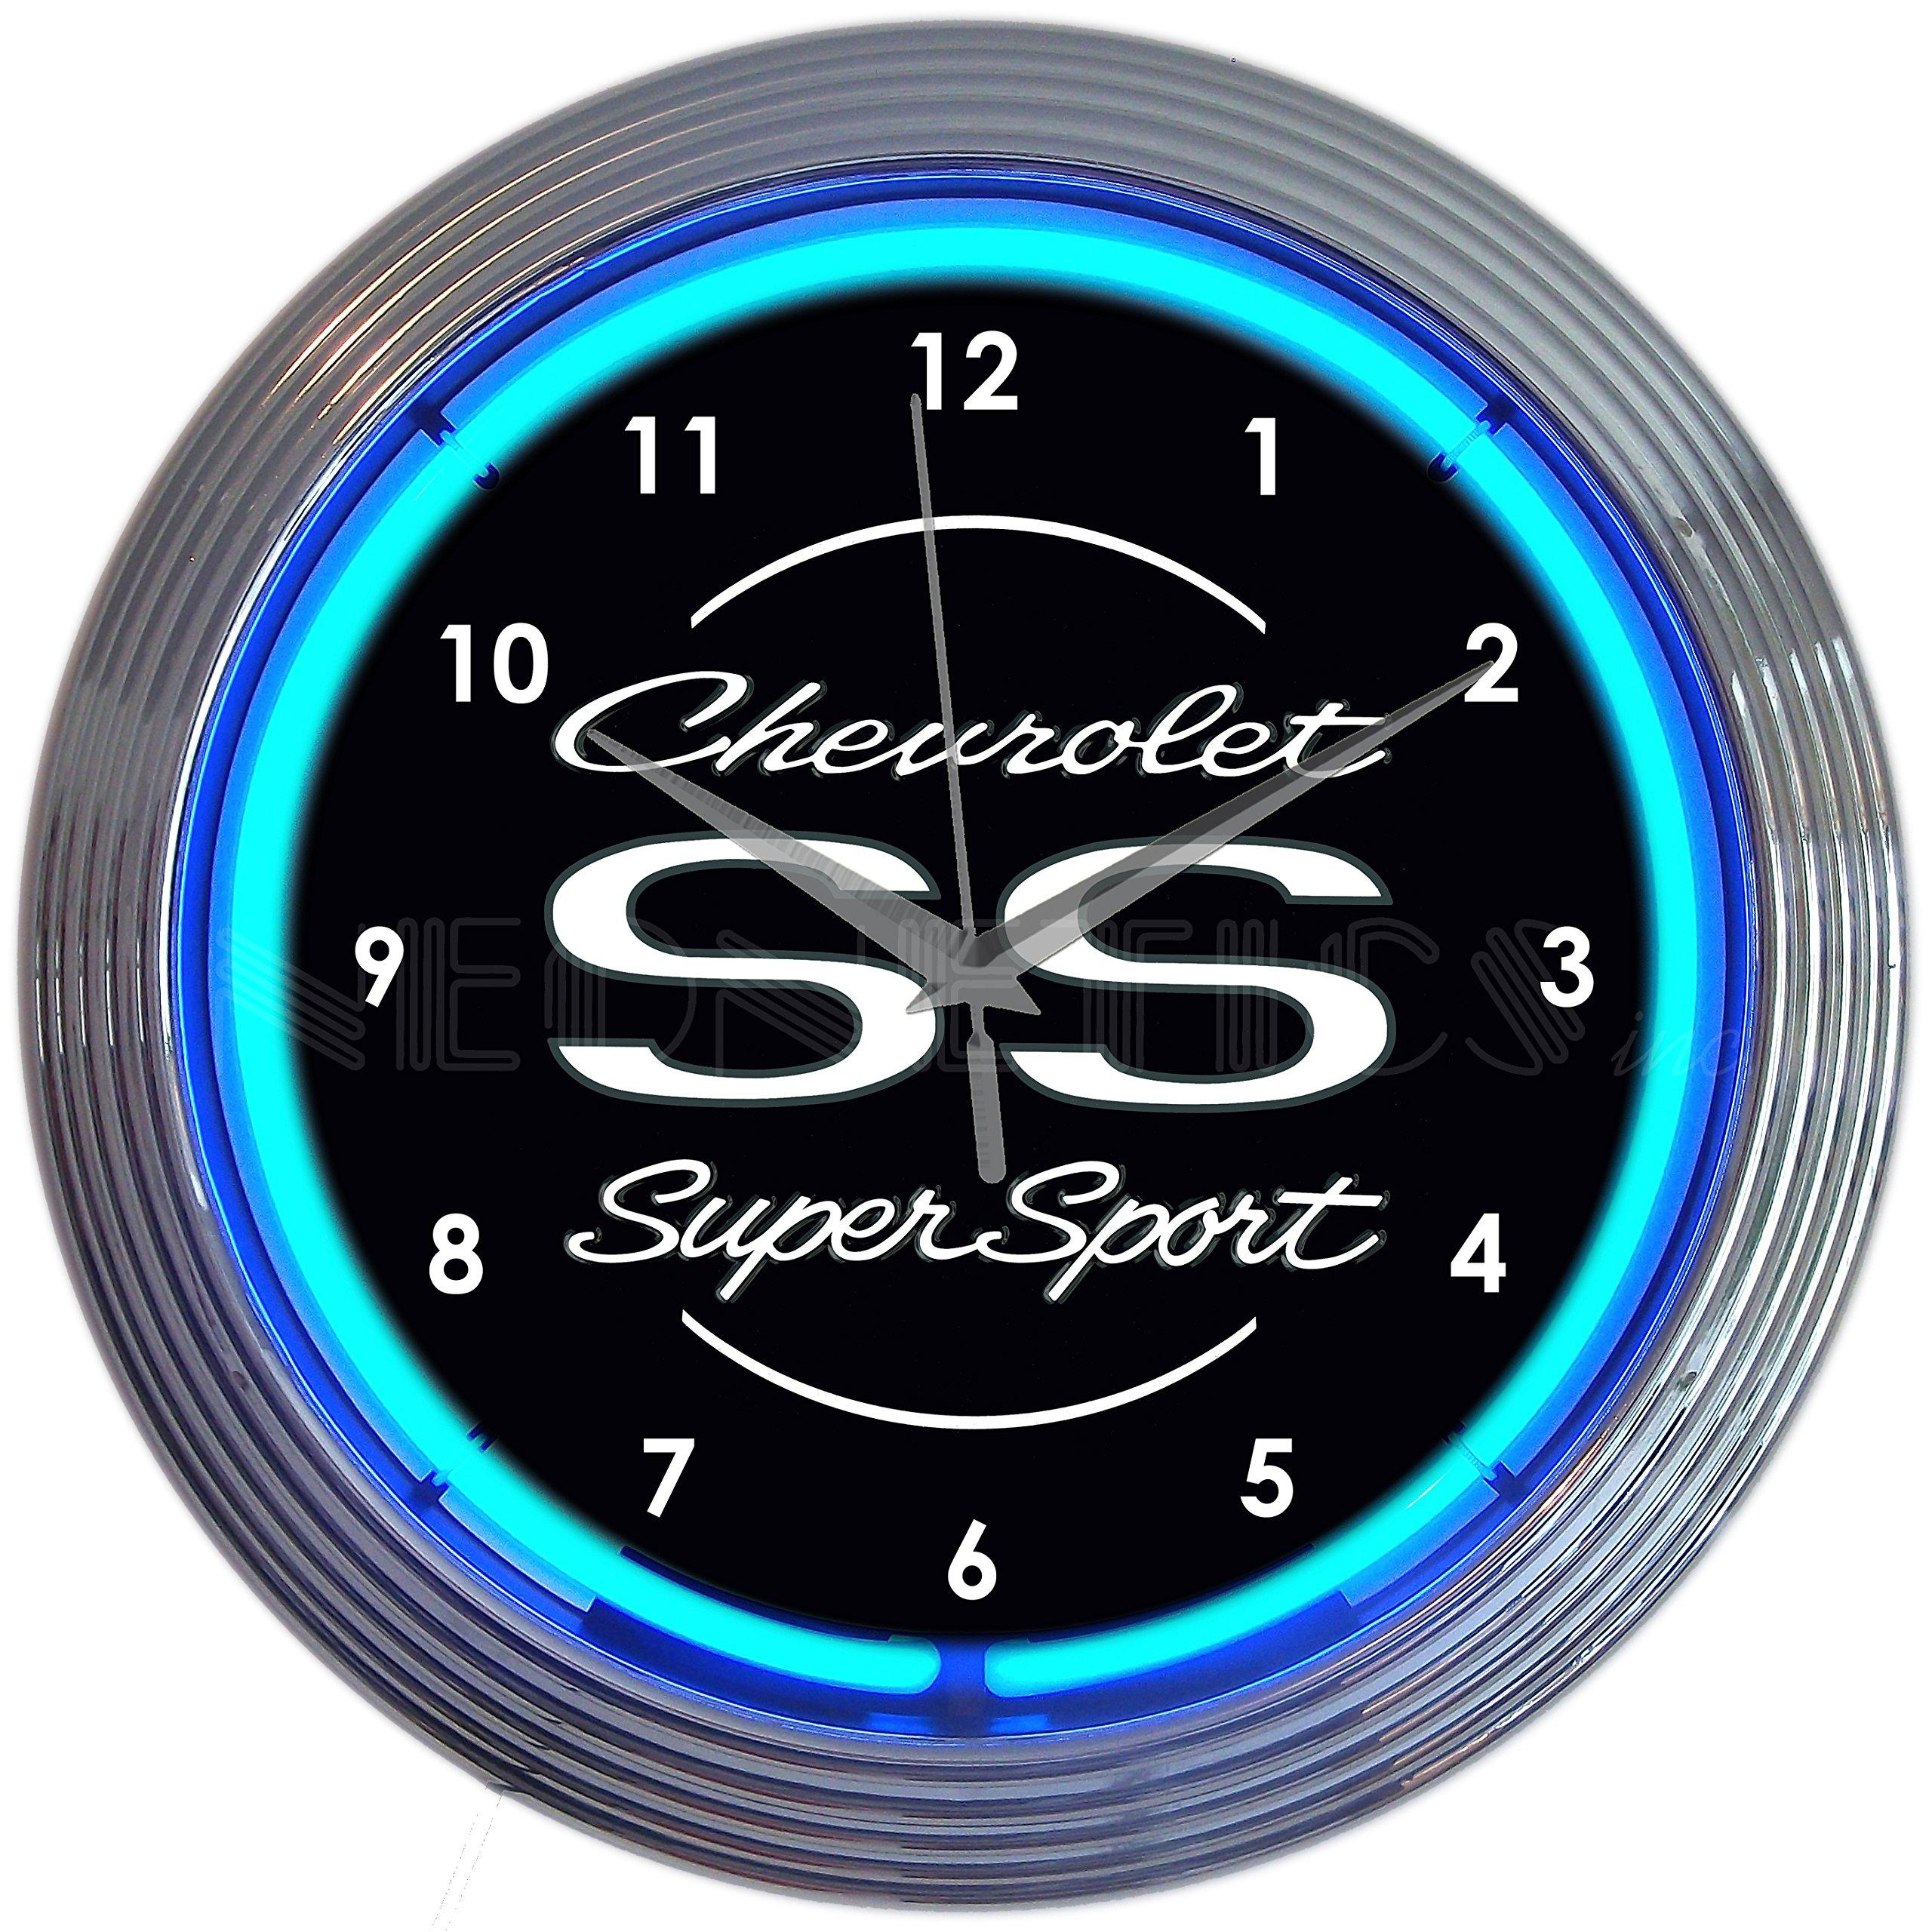 Neonetics 8CHVSS Chevrolet Chevy SS Super Sport Clock 15 Inch Diameter with Blue Neon